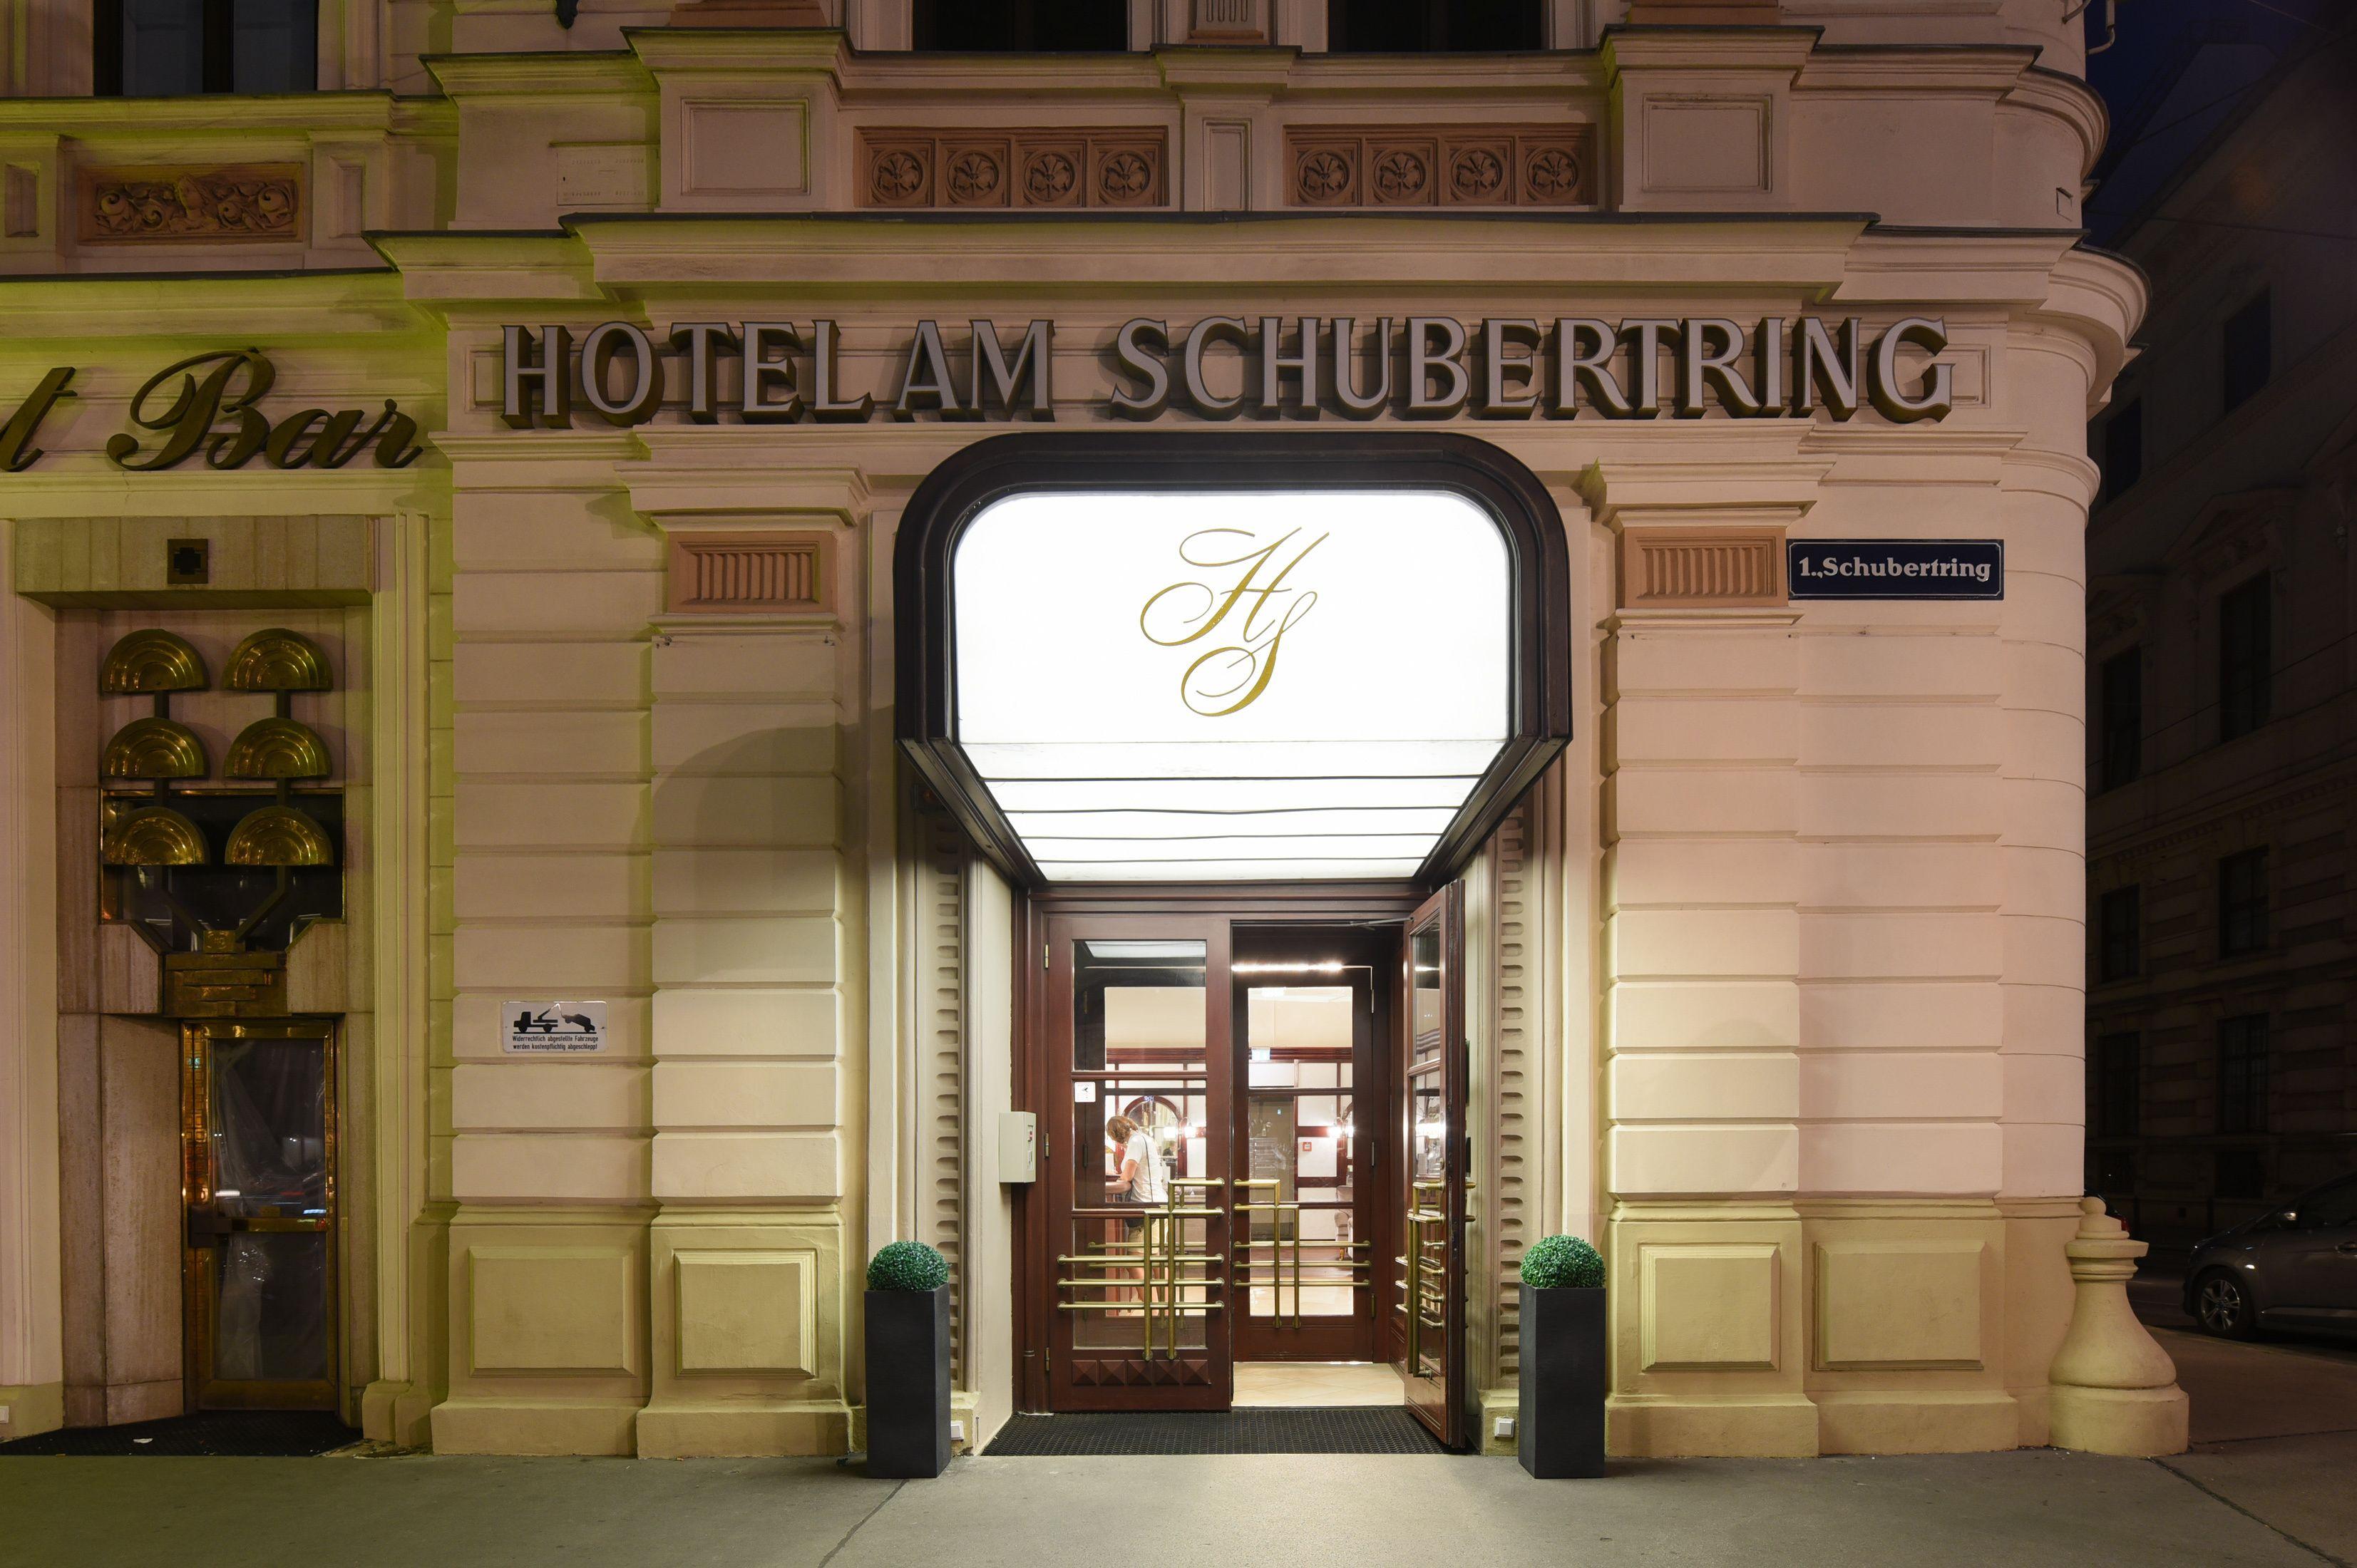 Am Schubertring